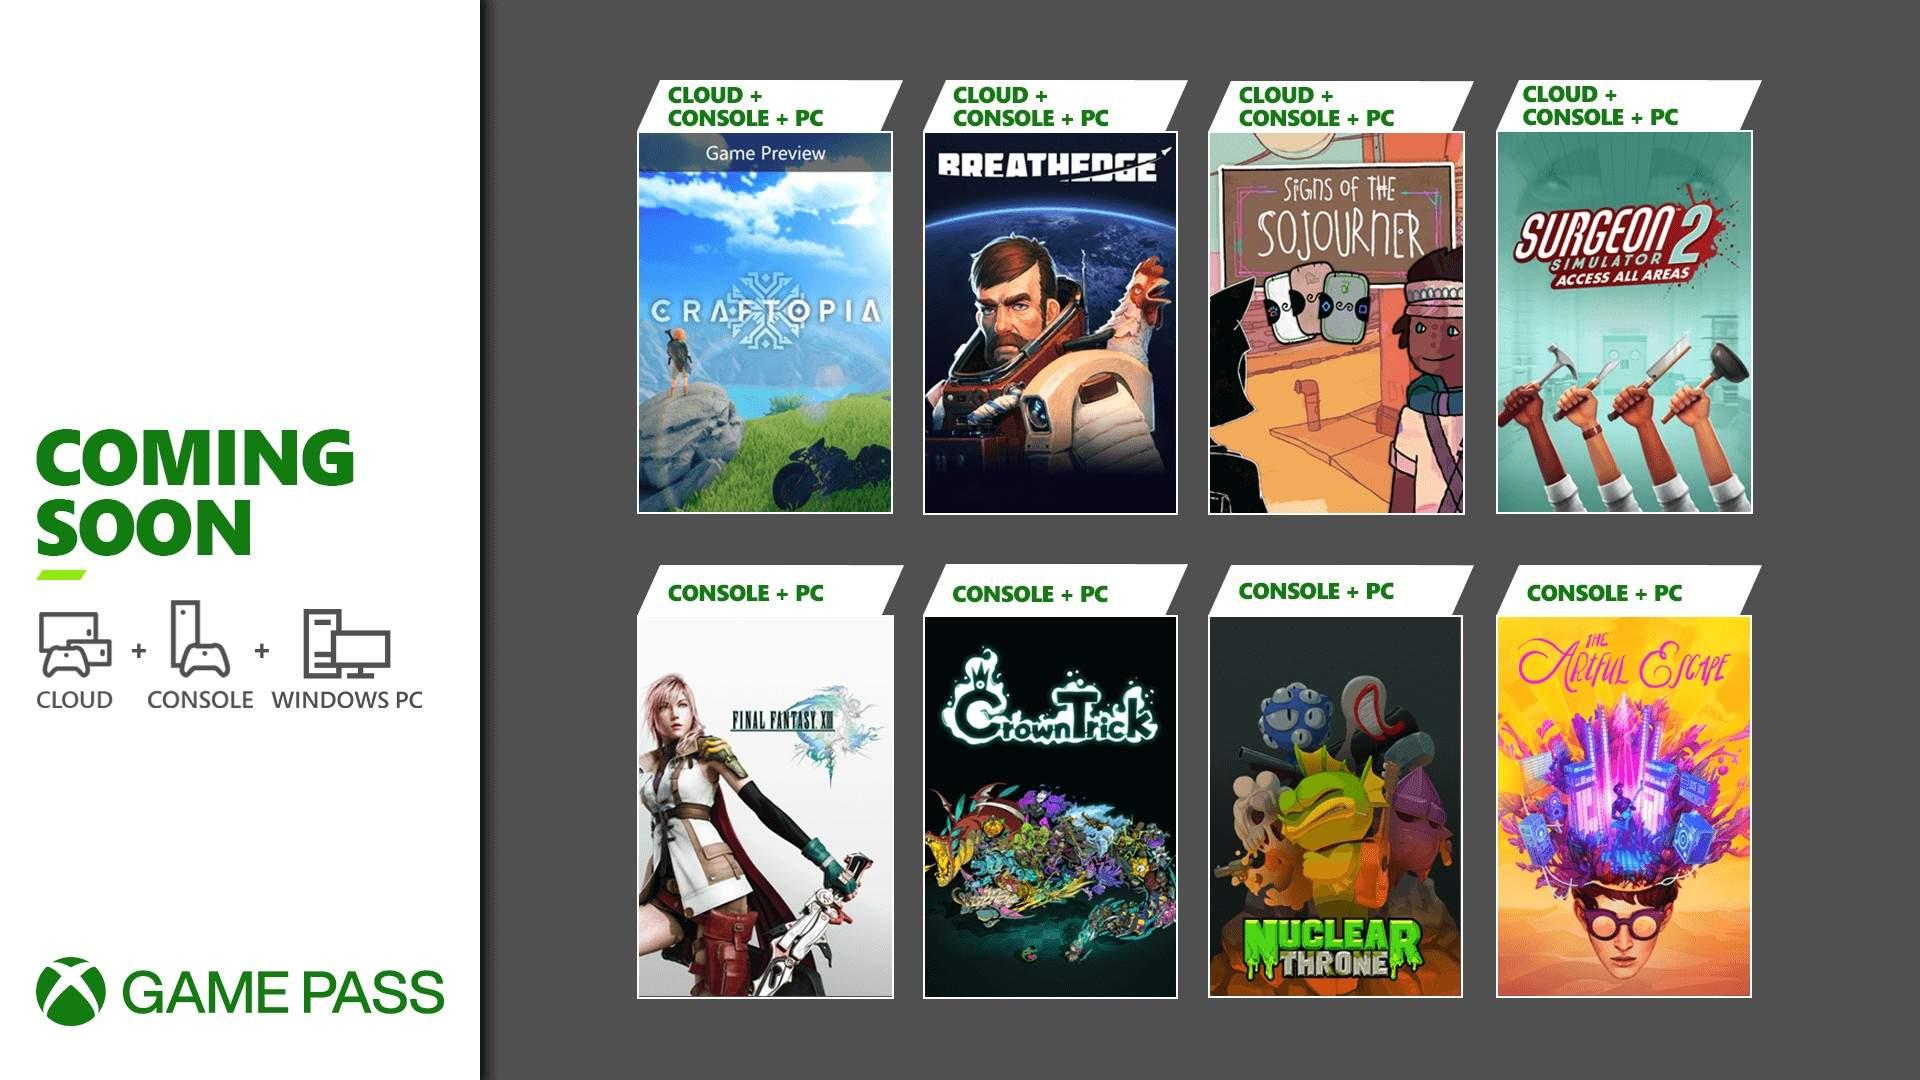 Xbox Game Pass Final Fantasy XIII